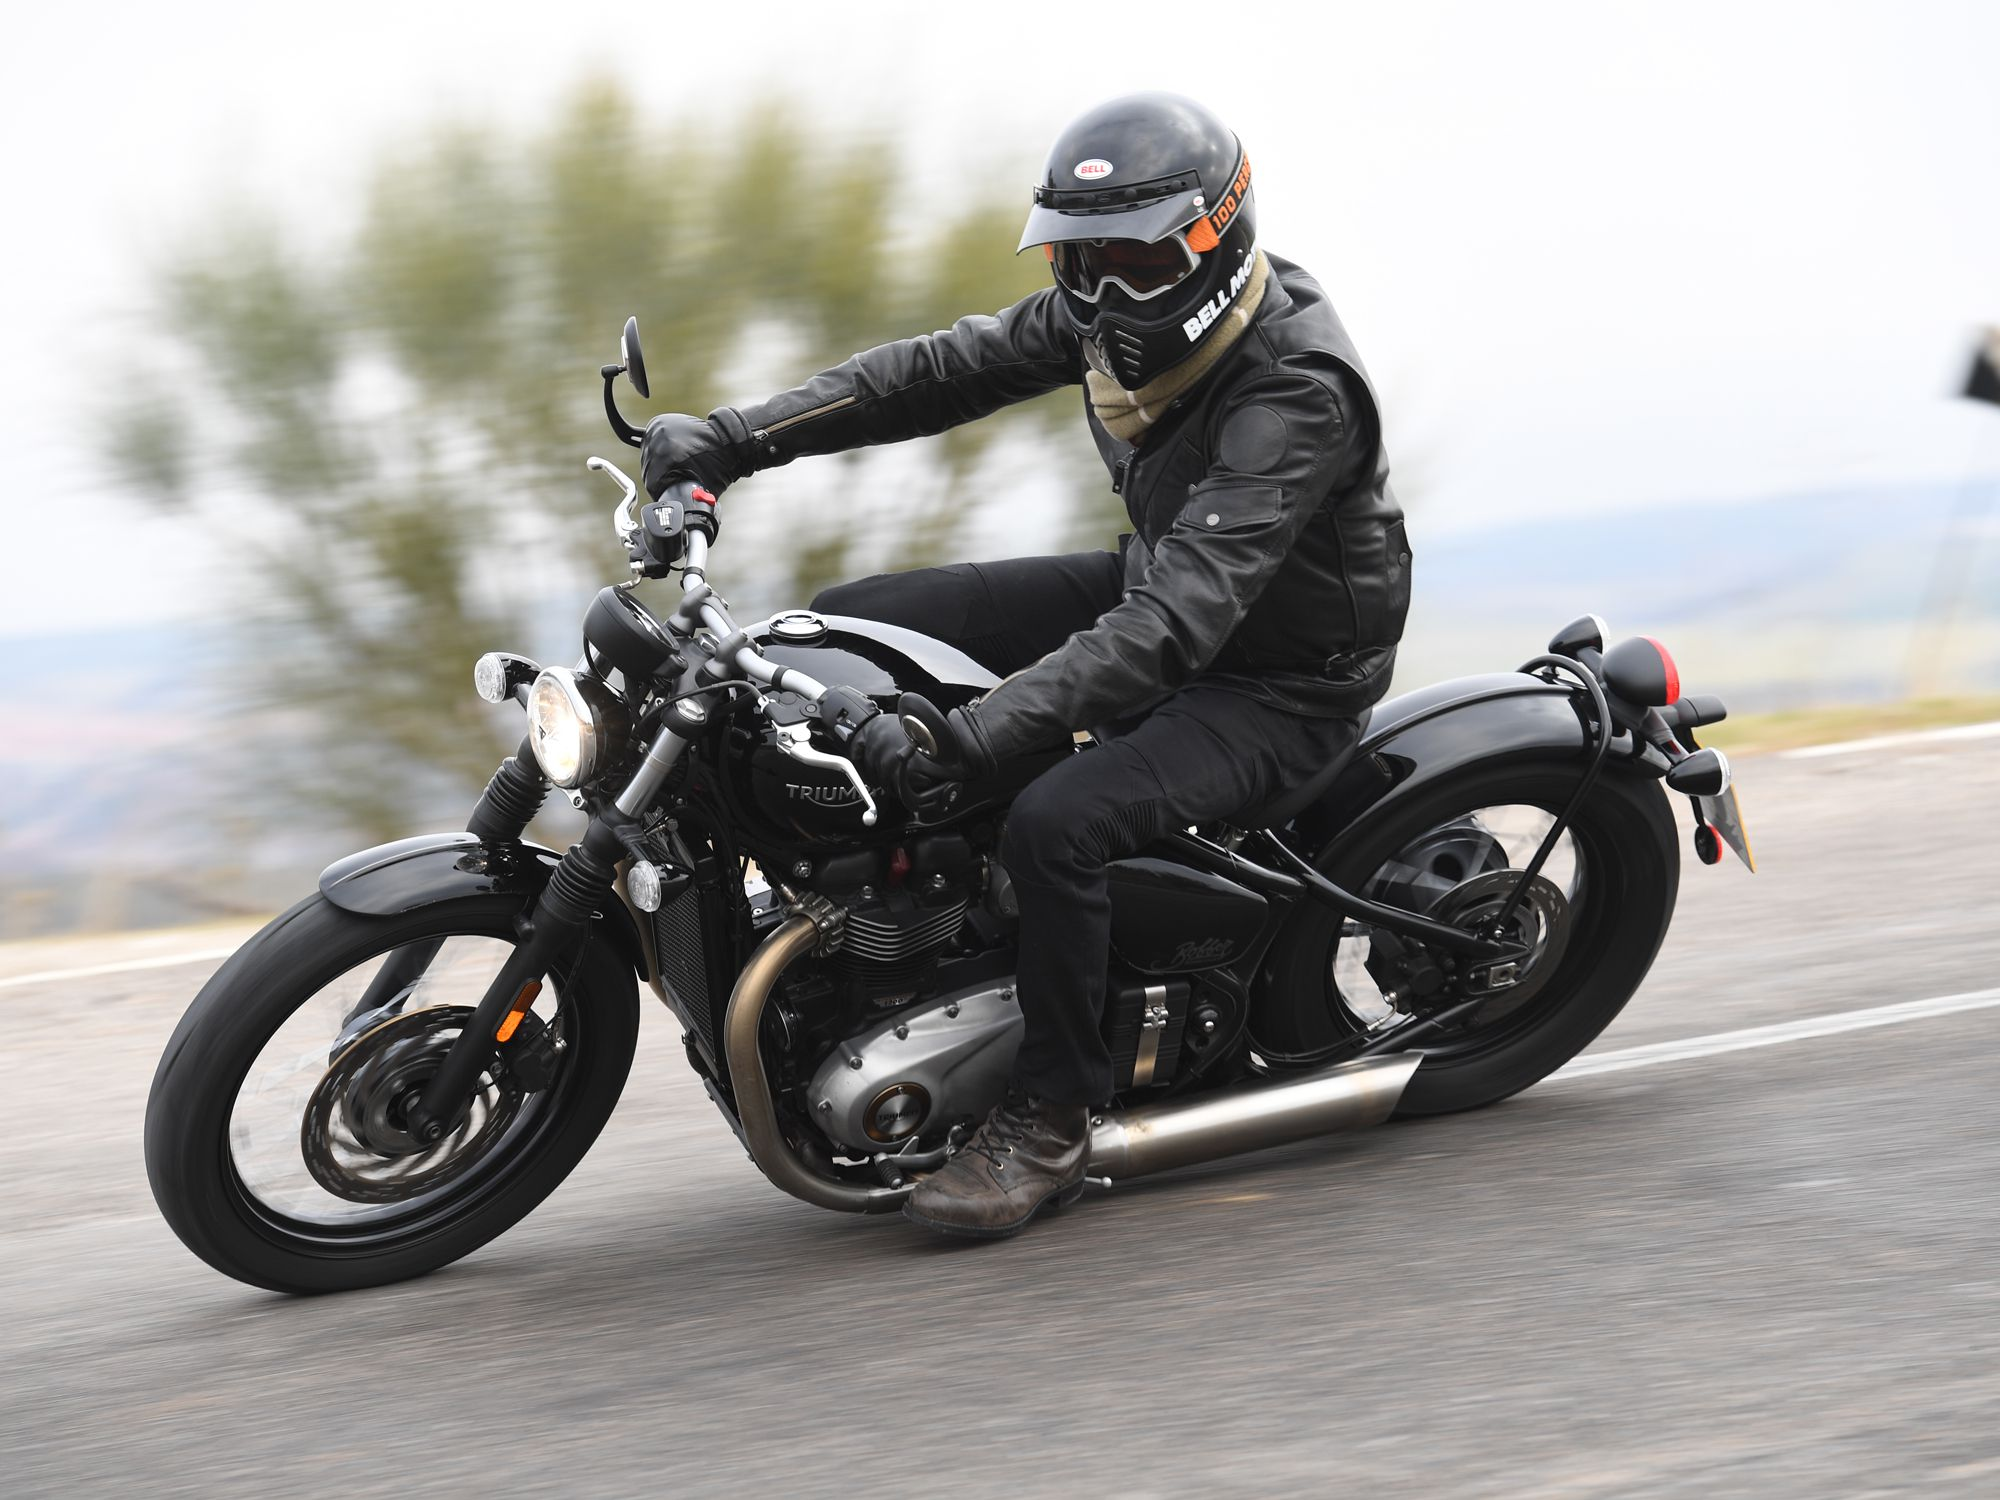 2017 Triumph Bonneville Bobber First Ride Review Motorcycle Cruiser